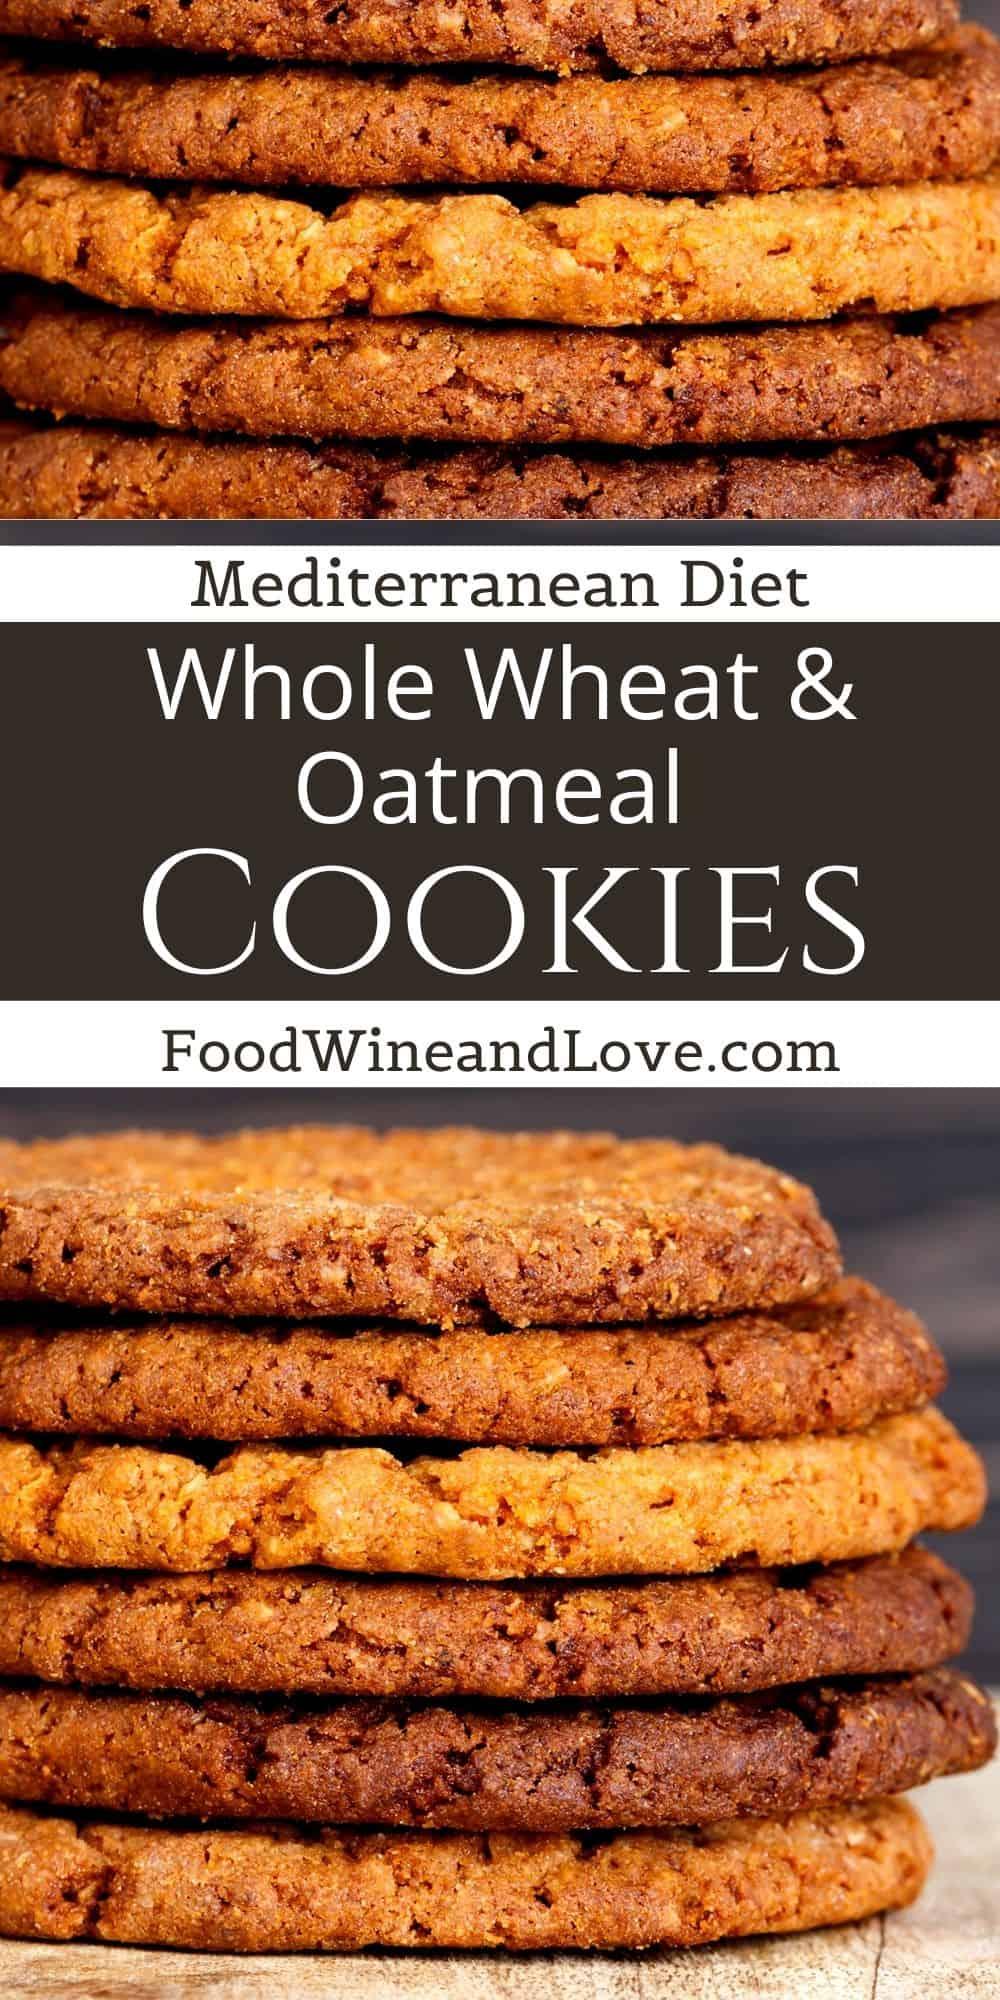 Whole Wheat Oatmeal Cookies